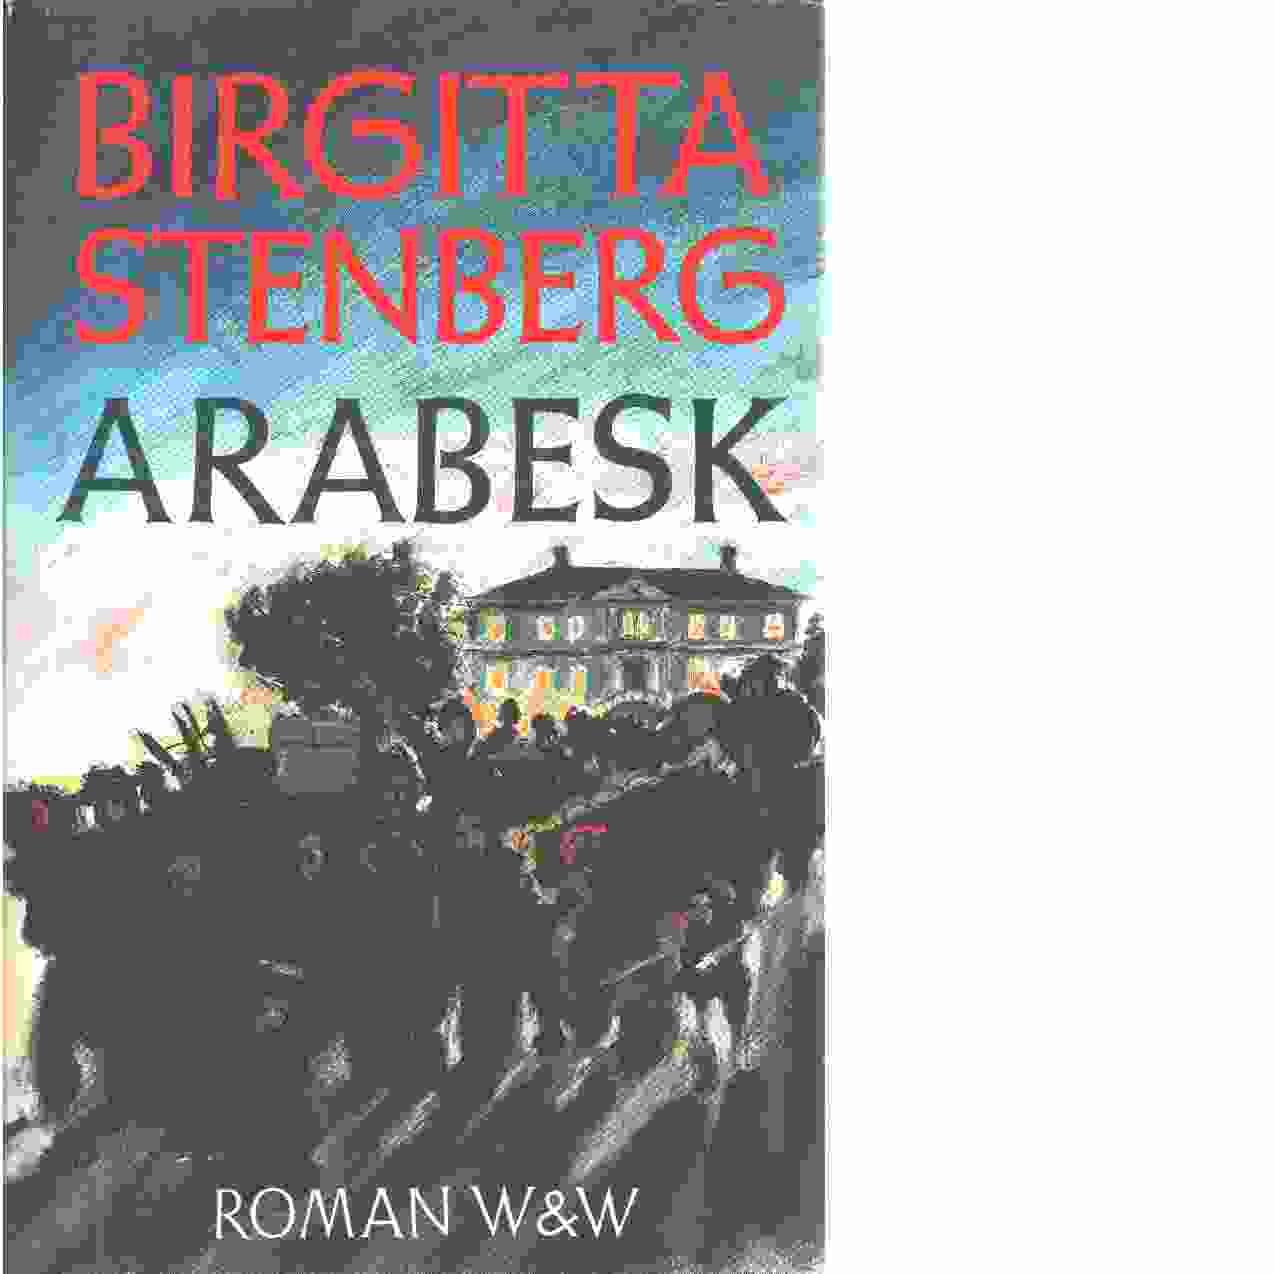 Arabesk - Stenberg, Birgitta